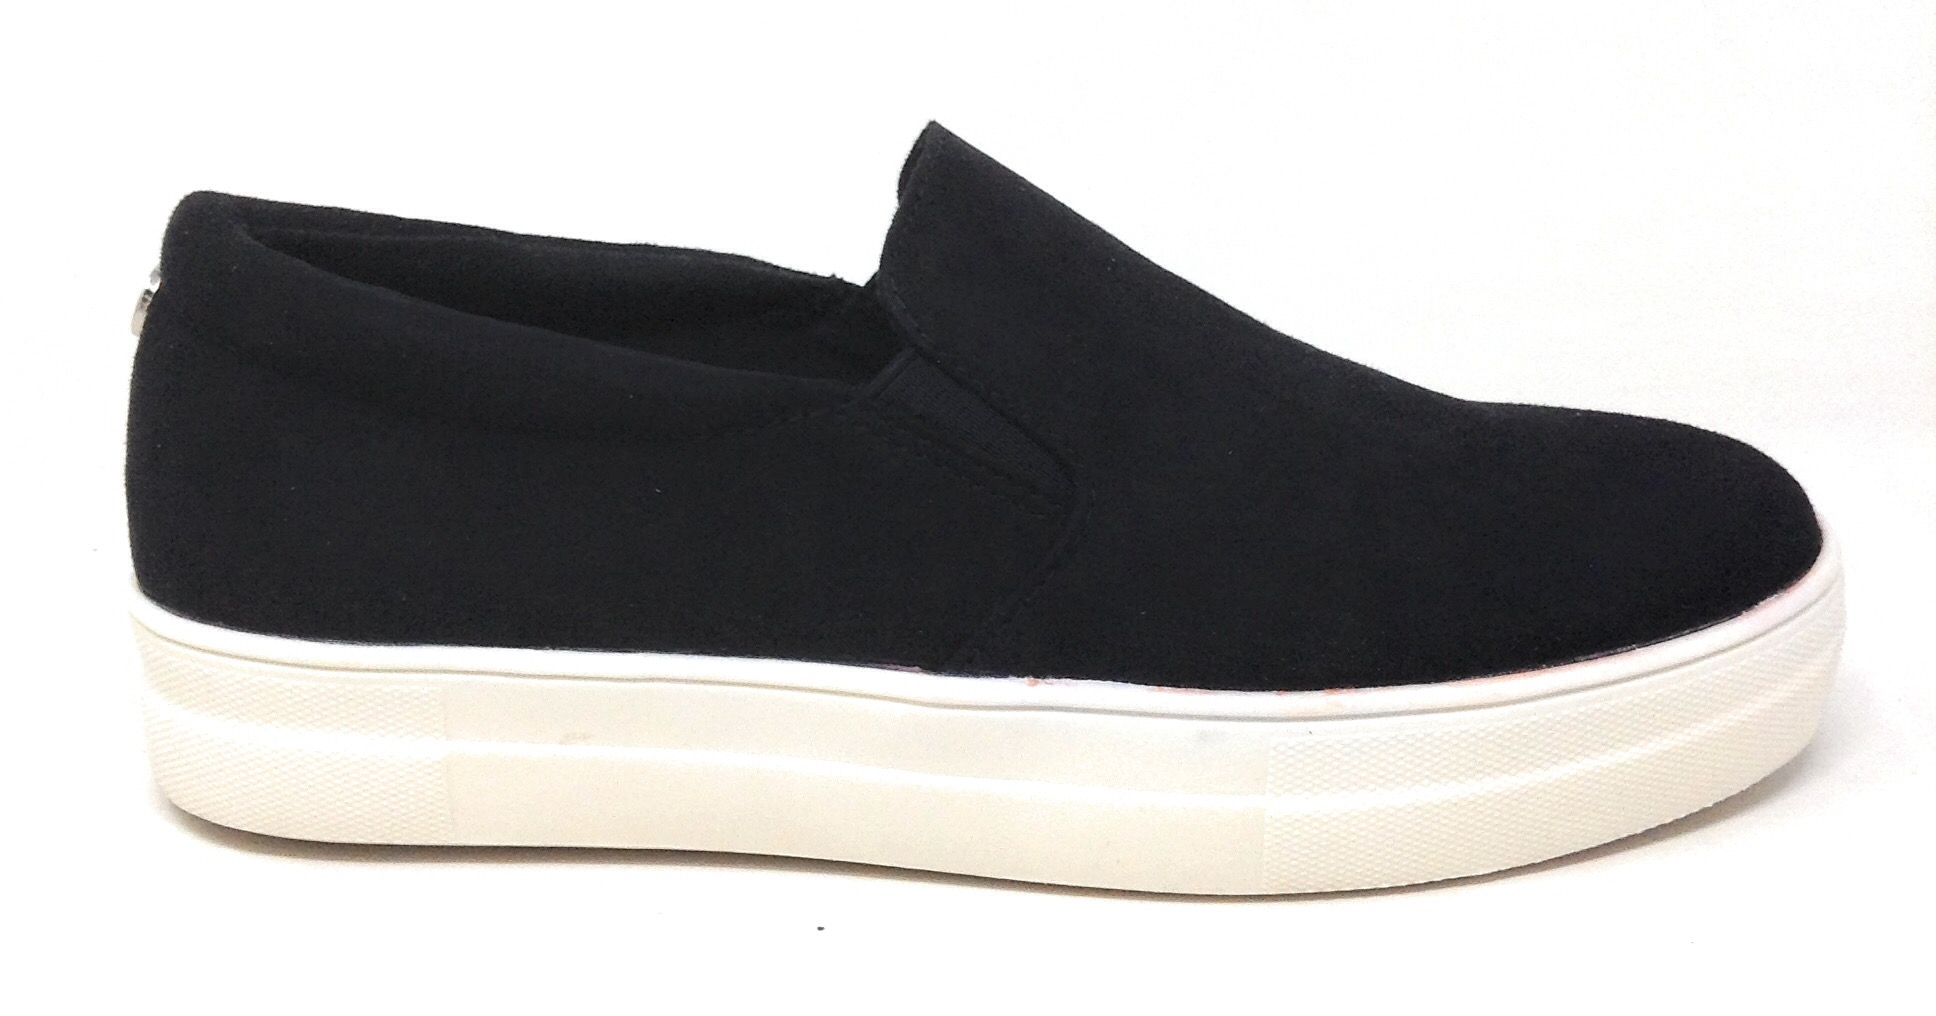 Gemma Slip On Casual Flat Shoes Black